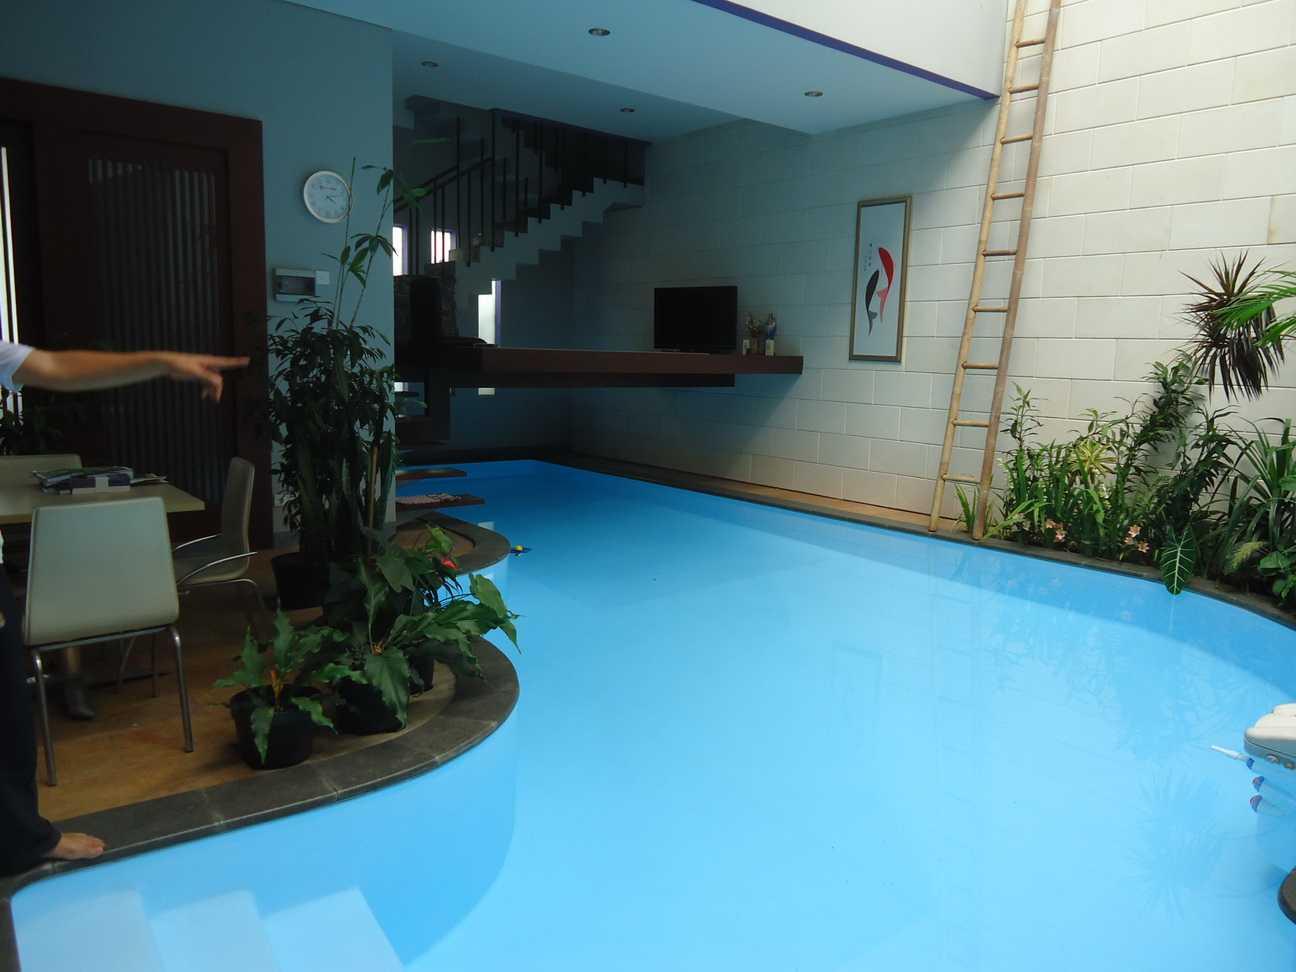 Budi Dharma The Relaxation House Gelong Selatan - Tomang Gelong Selatan - Tomang Gelong-Selatan-03  23852